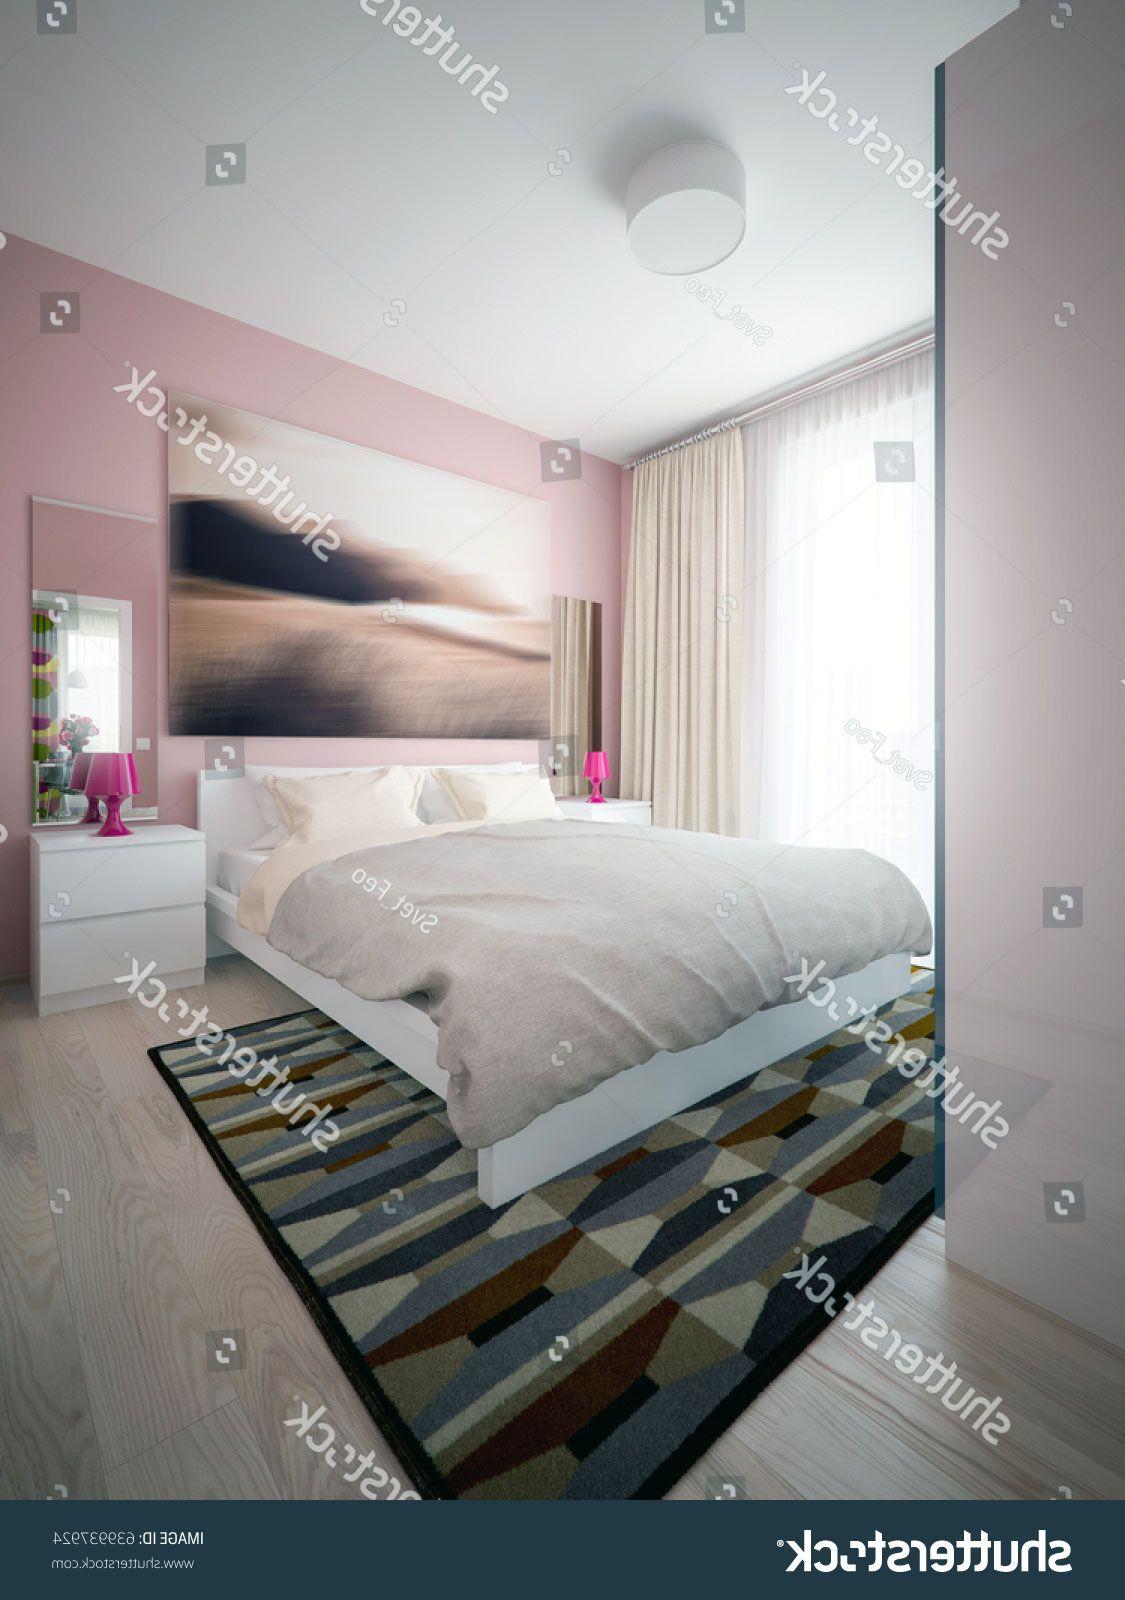 20 Modern Interior Bedroom Ideas For Scandinavian Style In 2020 Bedroom Interior Modern Scandinavian Interior Modern Interior